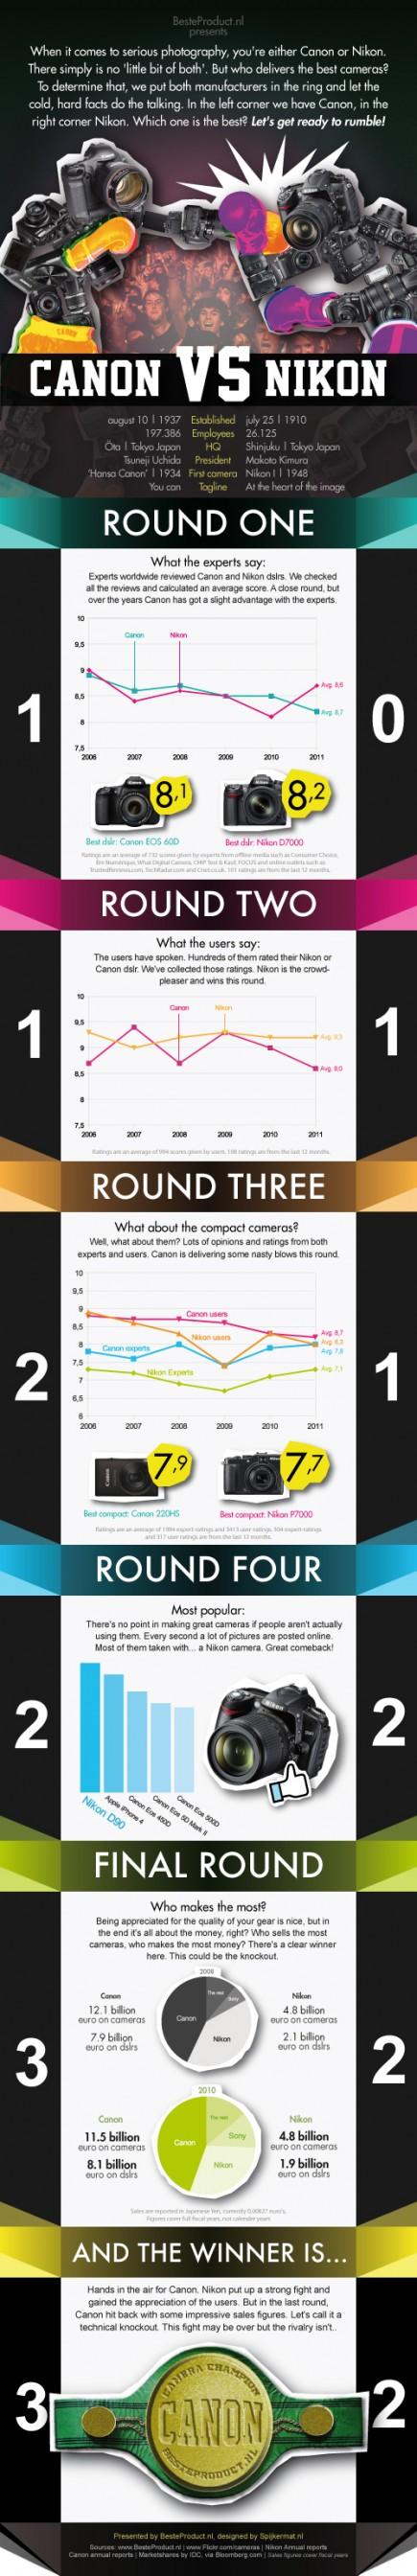 Canon vs Nikon (visual) | Albert Bredenhann